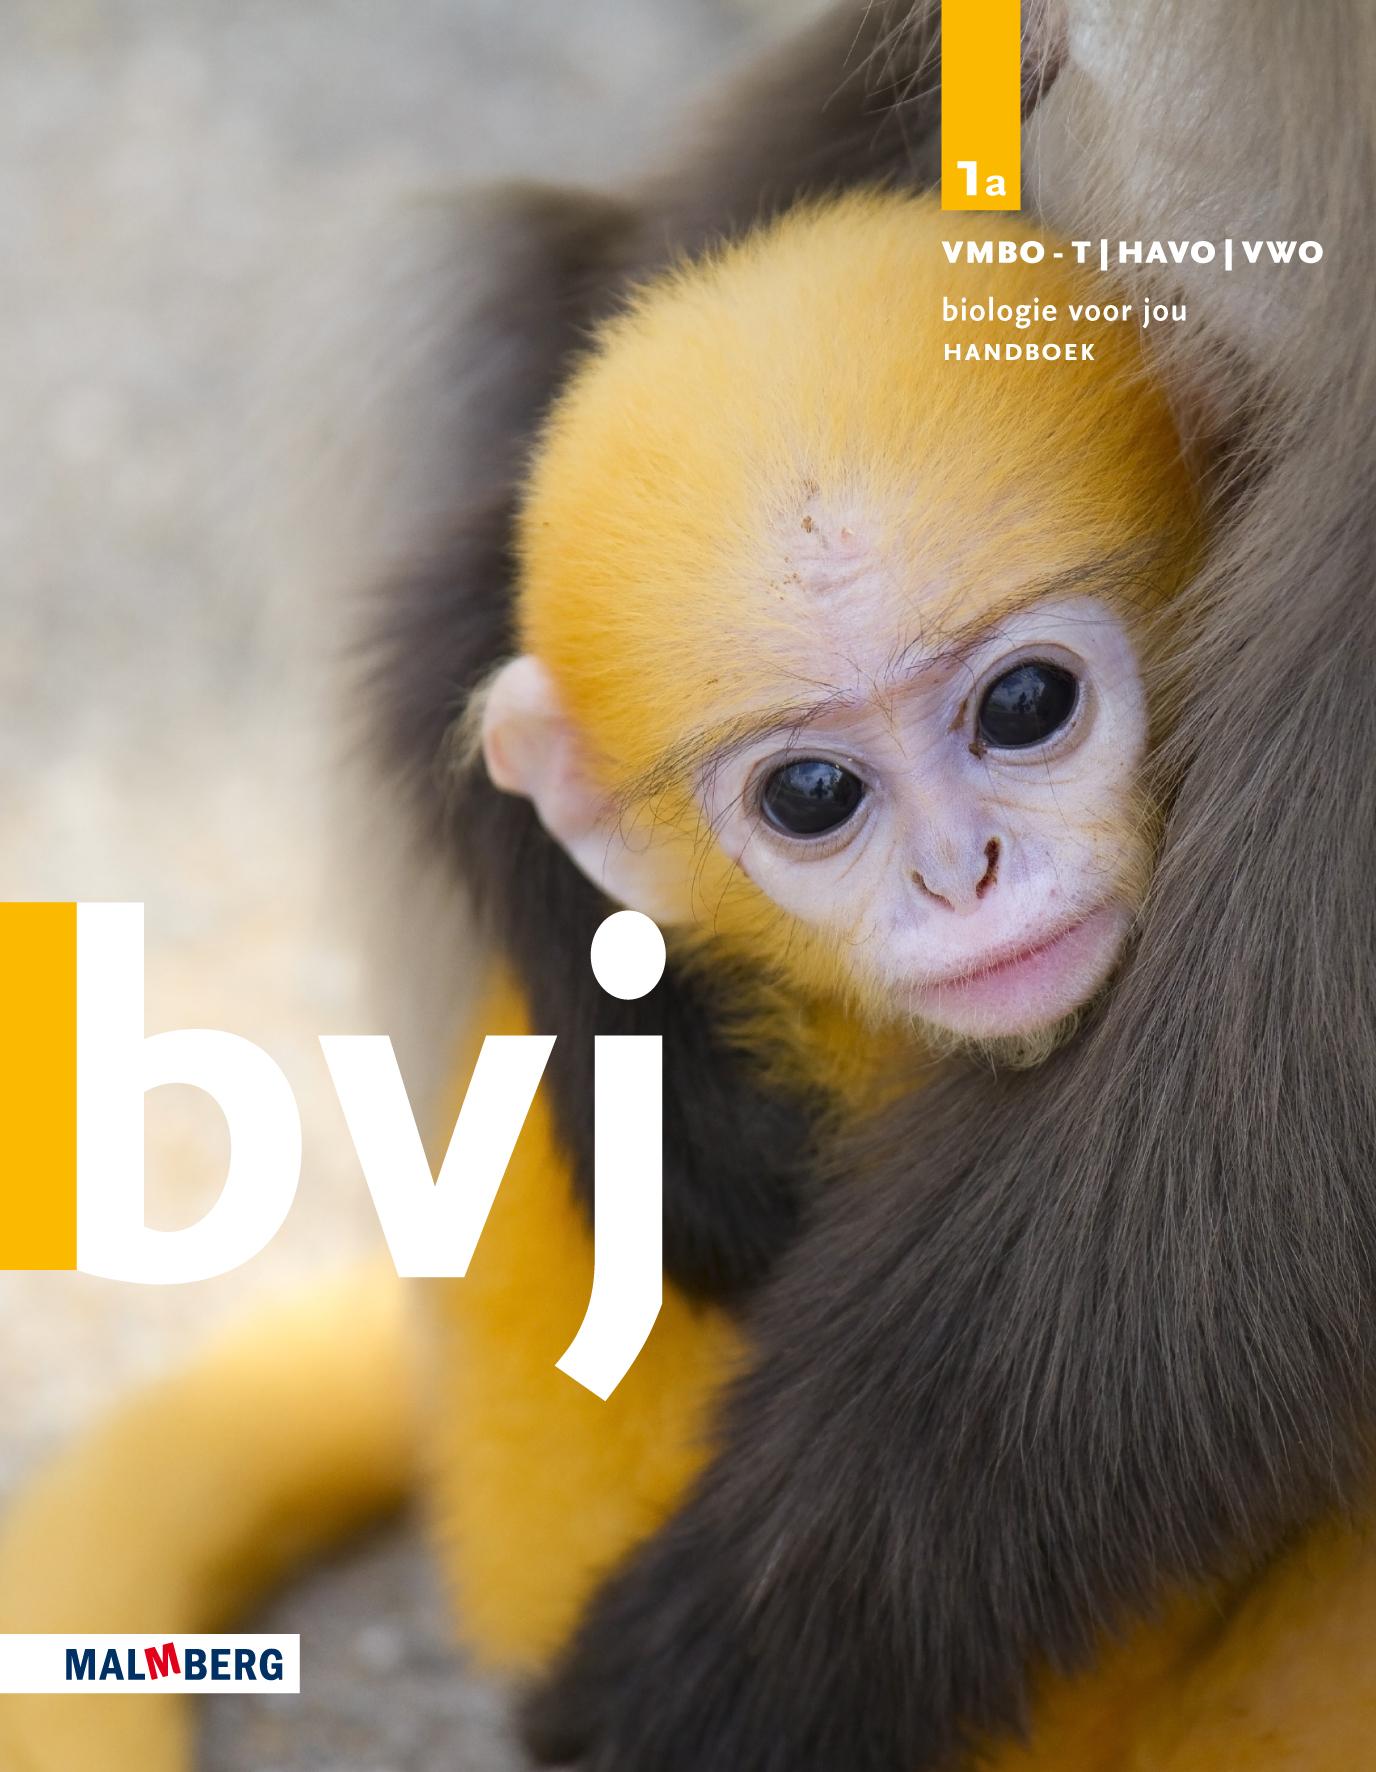 BVJ_Omslag_lj1_M.de.Wild.jpg